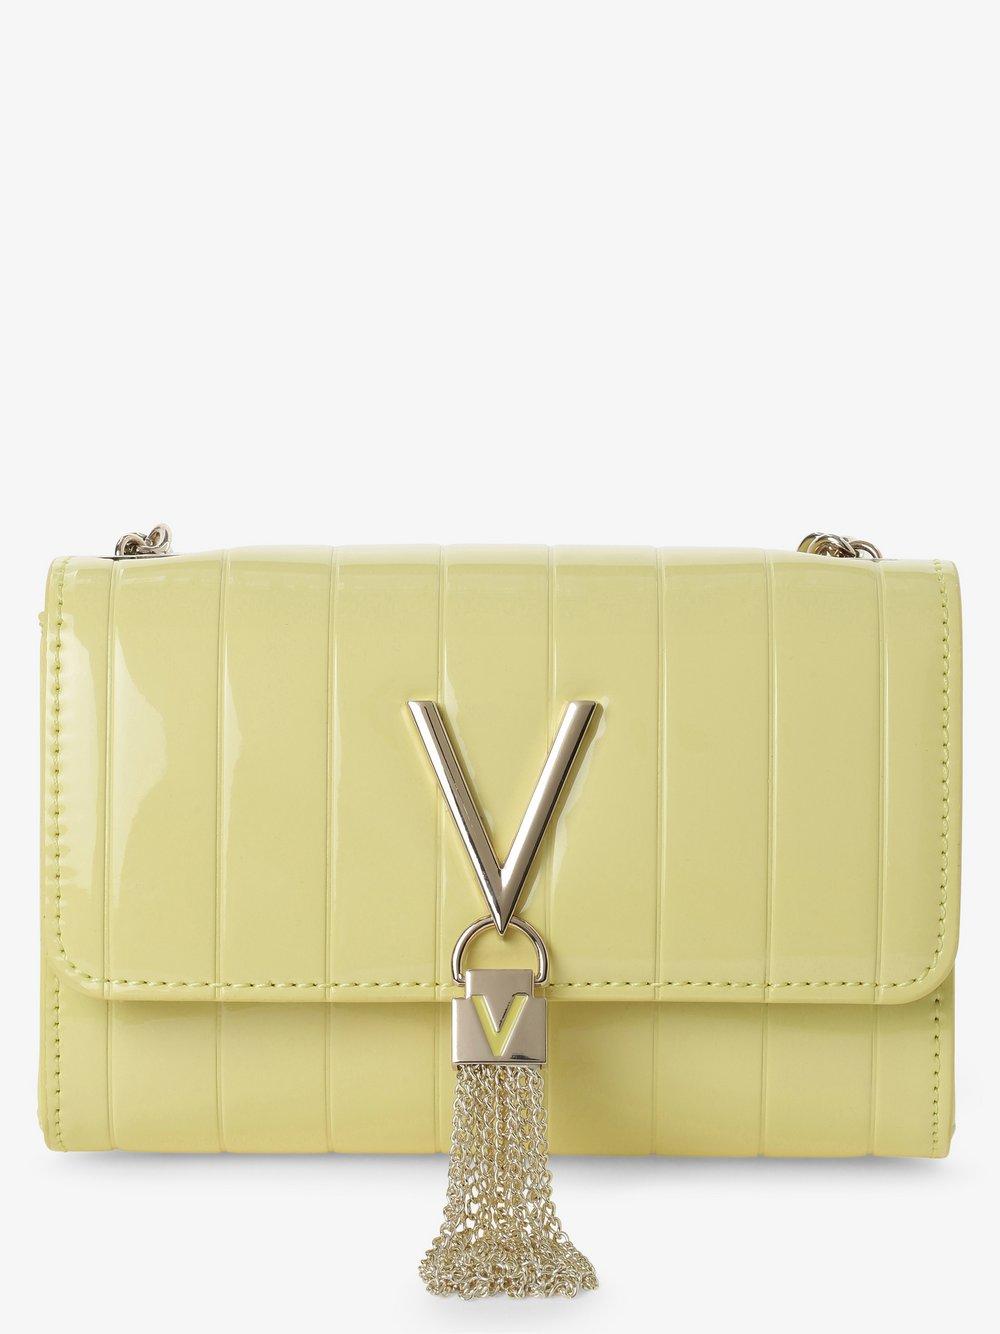 VALENTINO HANDBAGS – Damska torba na ramię – Bongo, żółty Van Graaf 465339-0005-00000